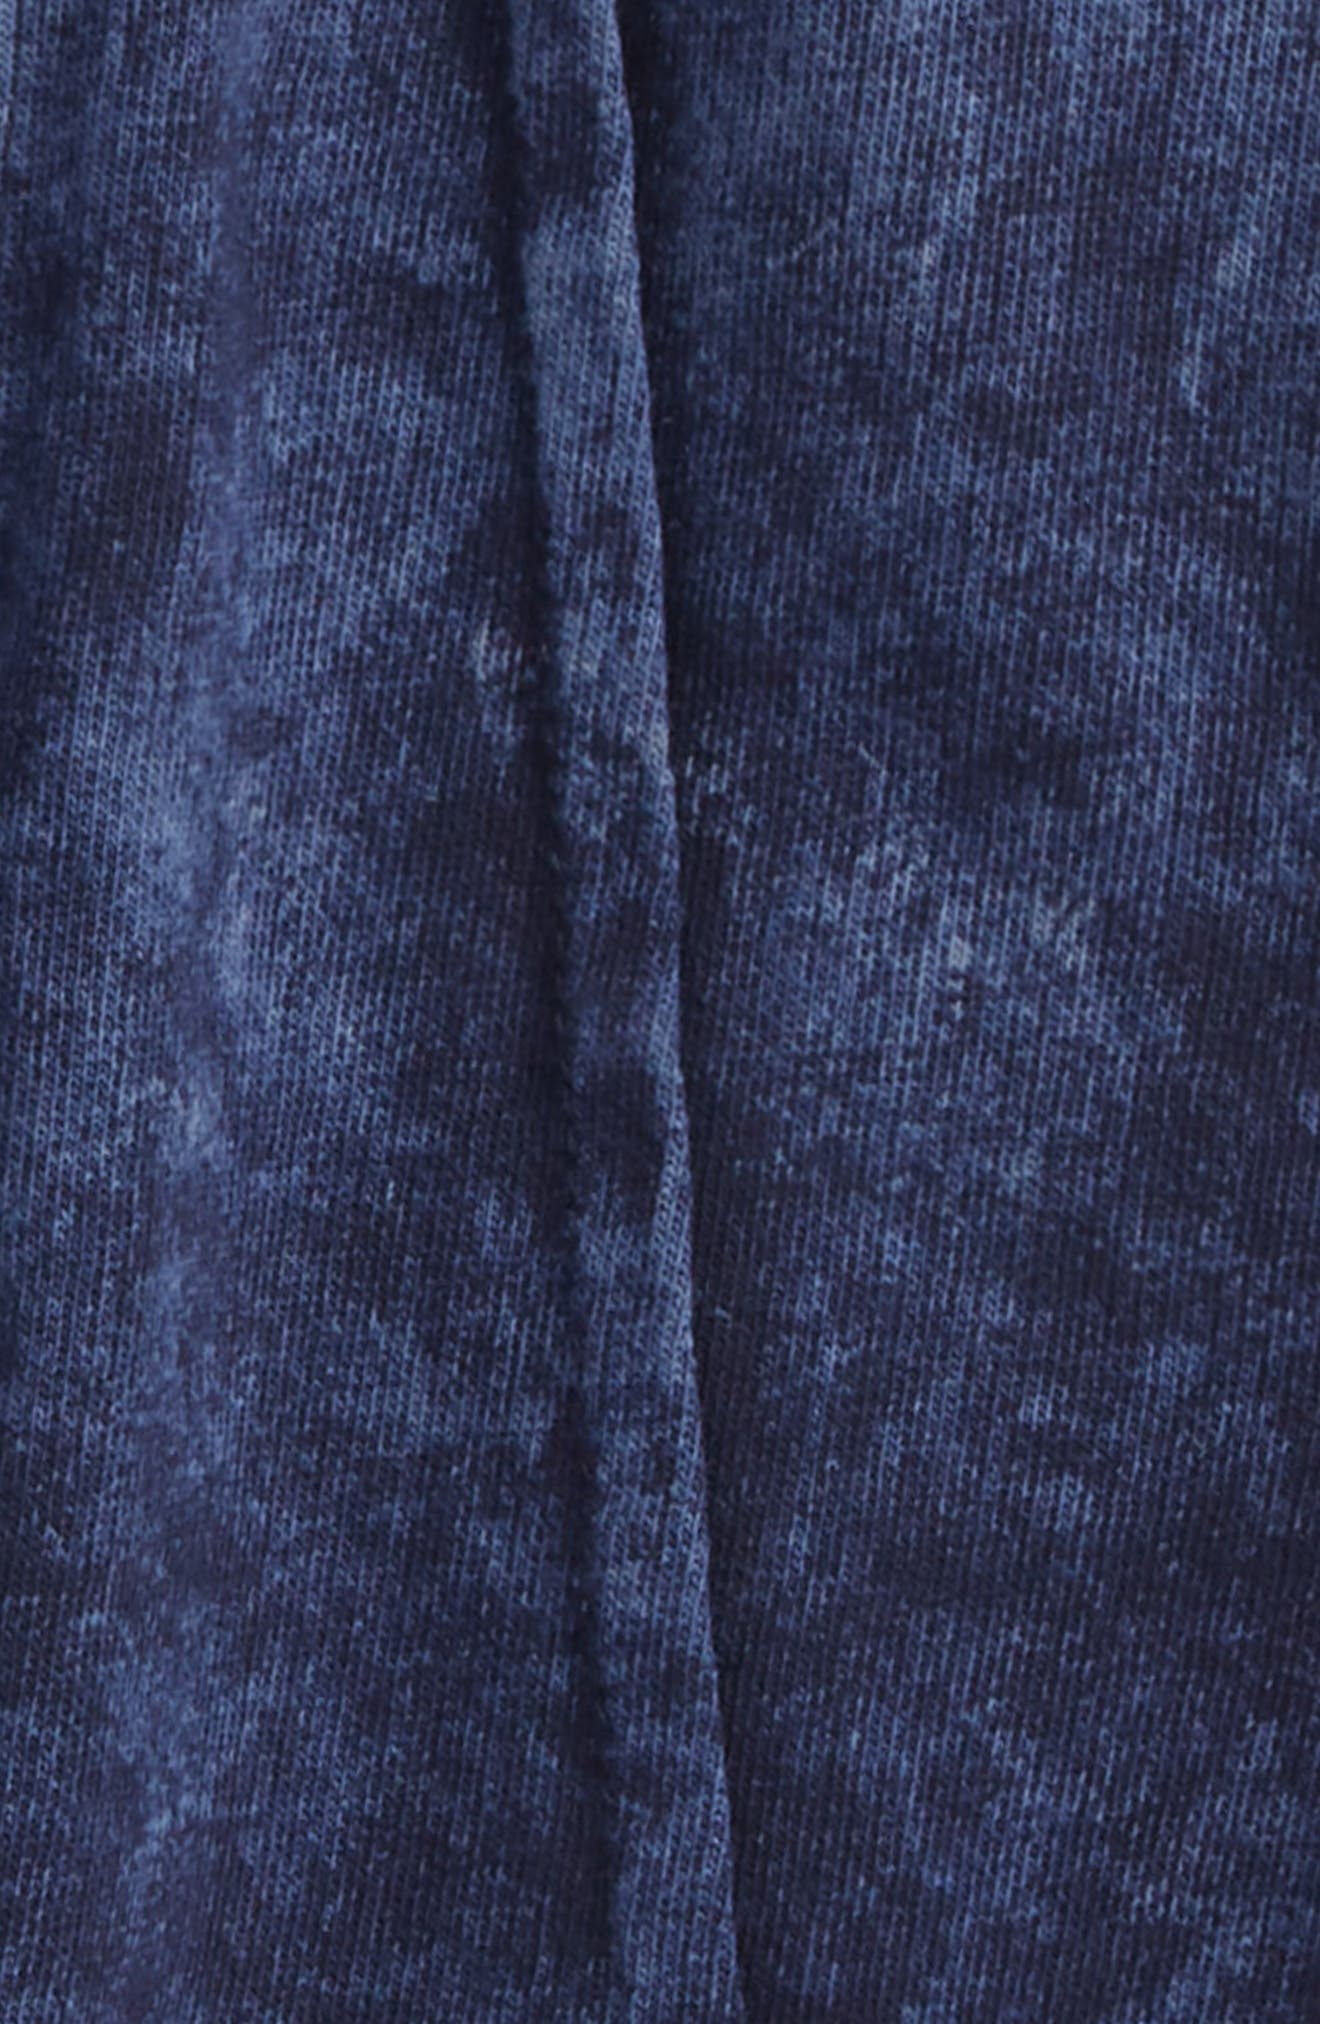 Acid Wash Pull-On Shorts,                             Alternate thumbnail 2, color,                             412